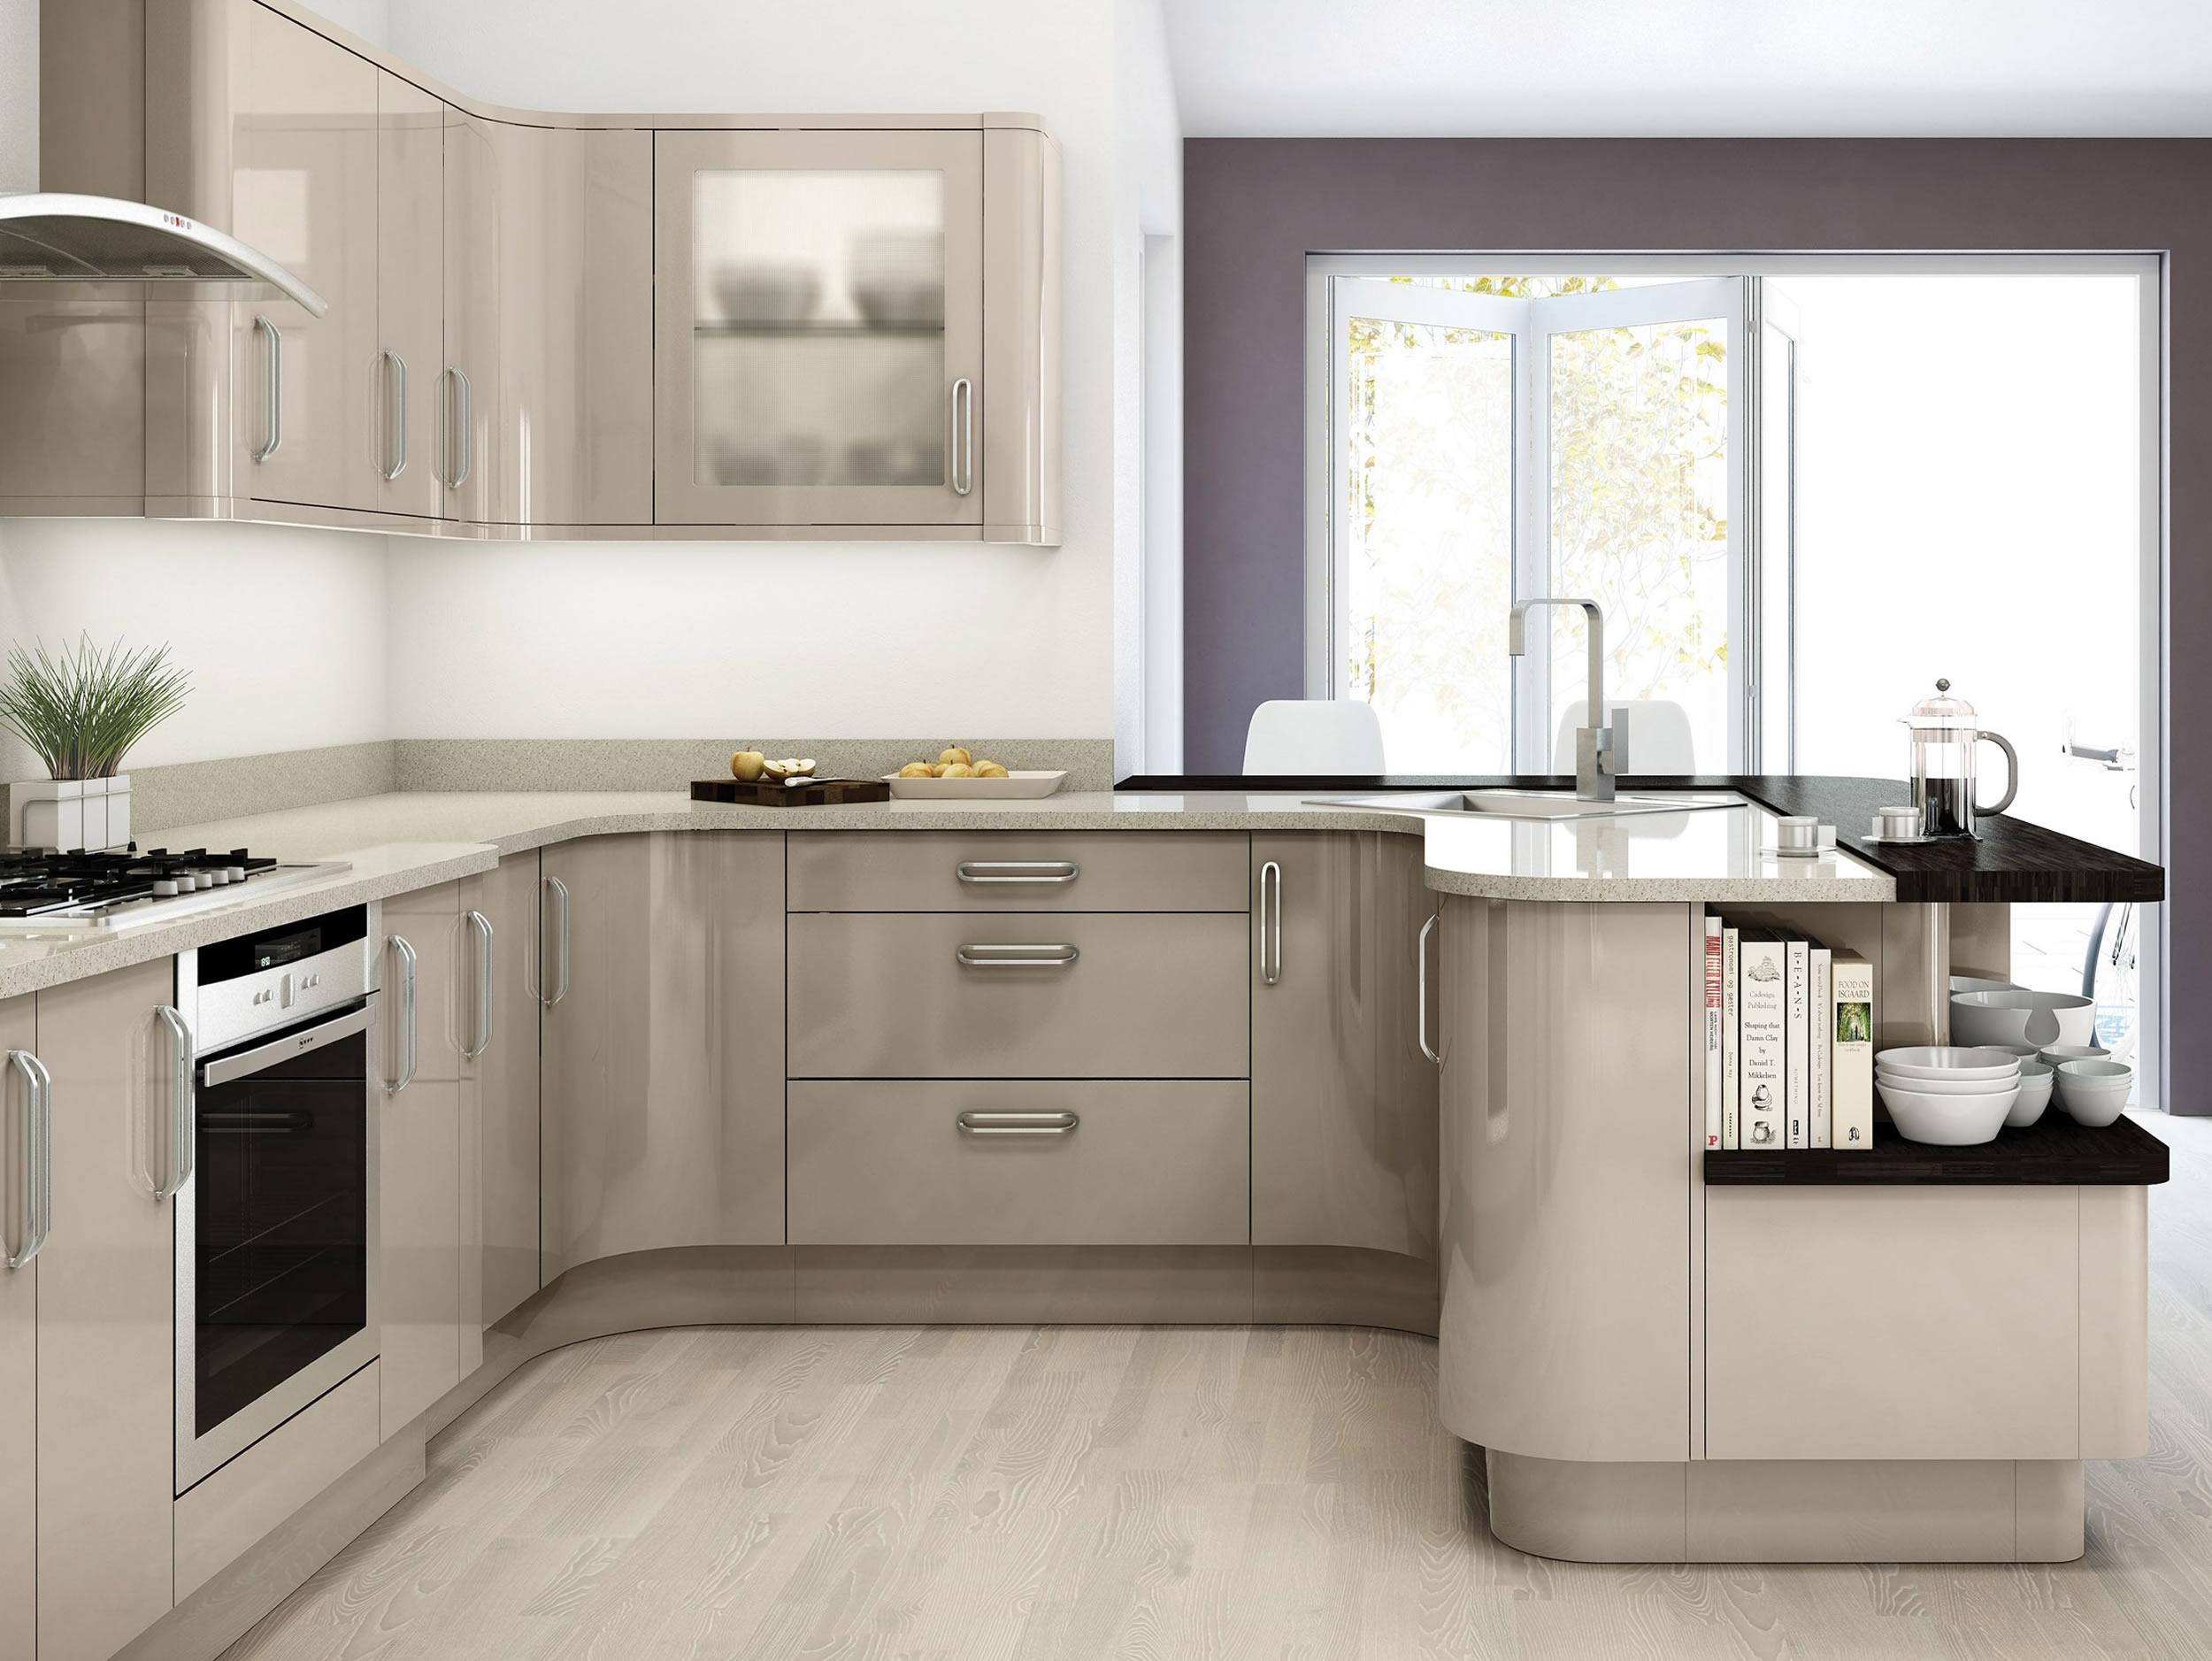 Small appliances for kitchen Photo - 12